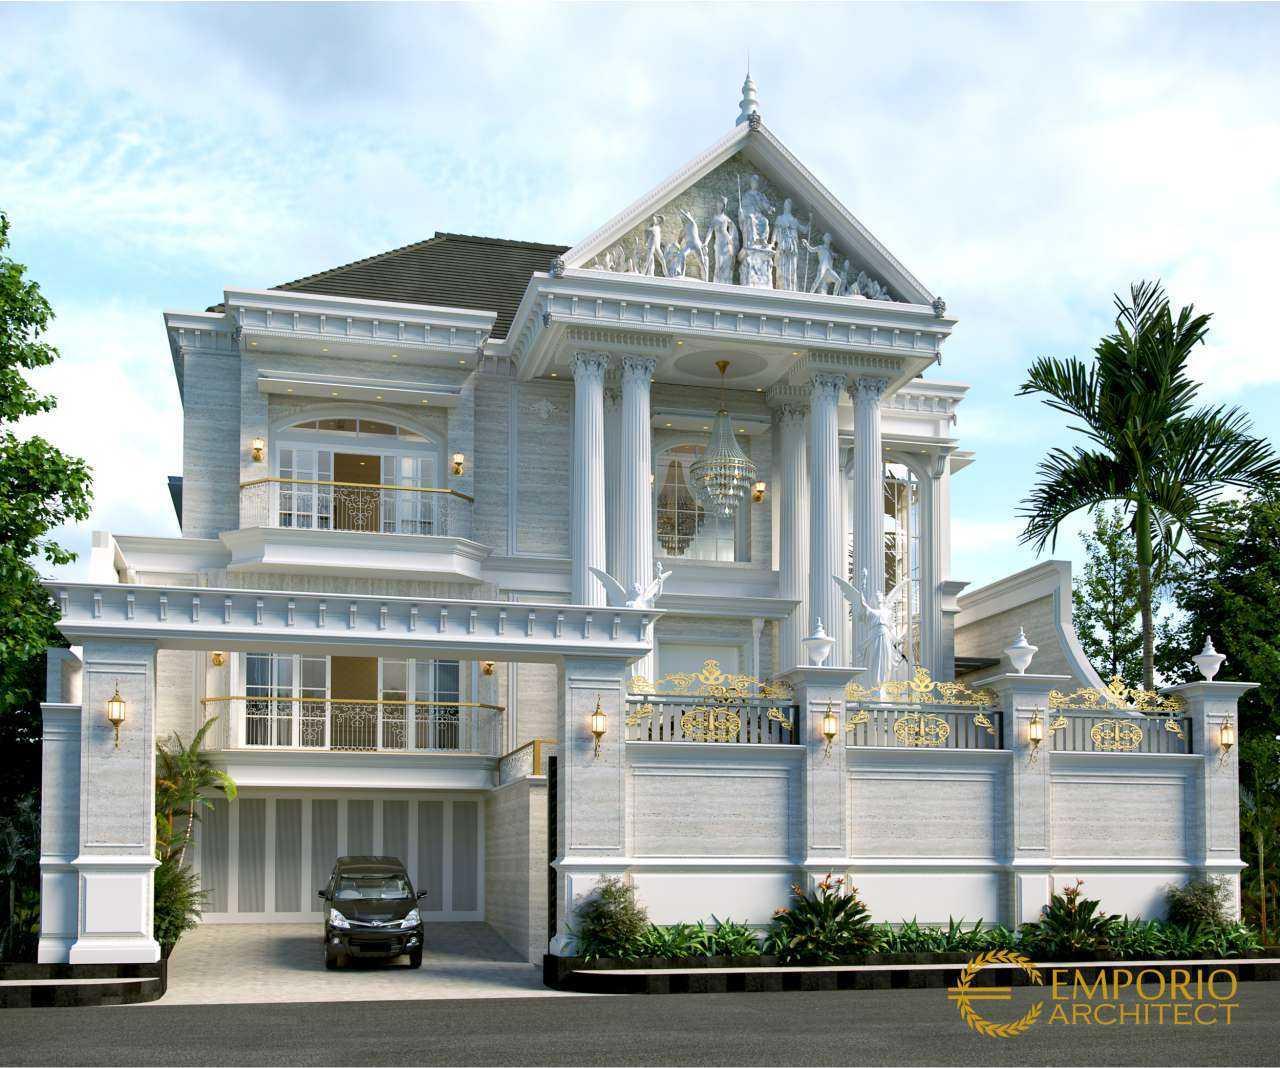 Emporio Architect Jasa Arsitek Denpasar Desain Rumah Classic 3 Lantai 772 @ Denpasar, Bali Kota Denpasar, Bali, Indonesia Kota Denpasar, Bali, Indonesia Emporio-Architect-Jasa-Arsitek-Denpasar-Desain-Rumah-Classic-3-Lantai-350-Denpasar-Bali Classic 94561